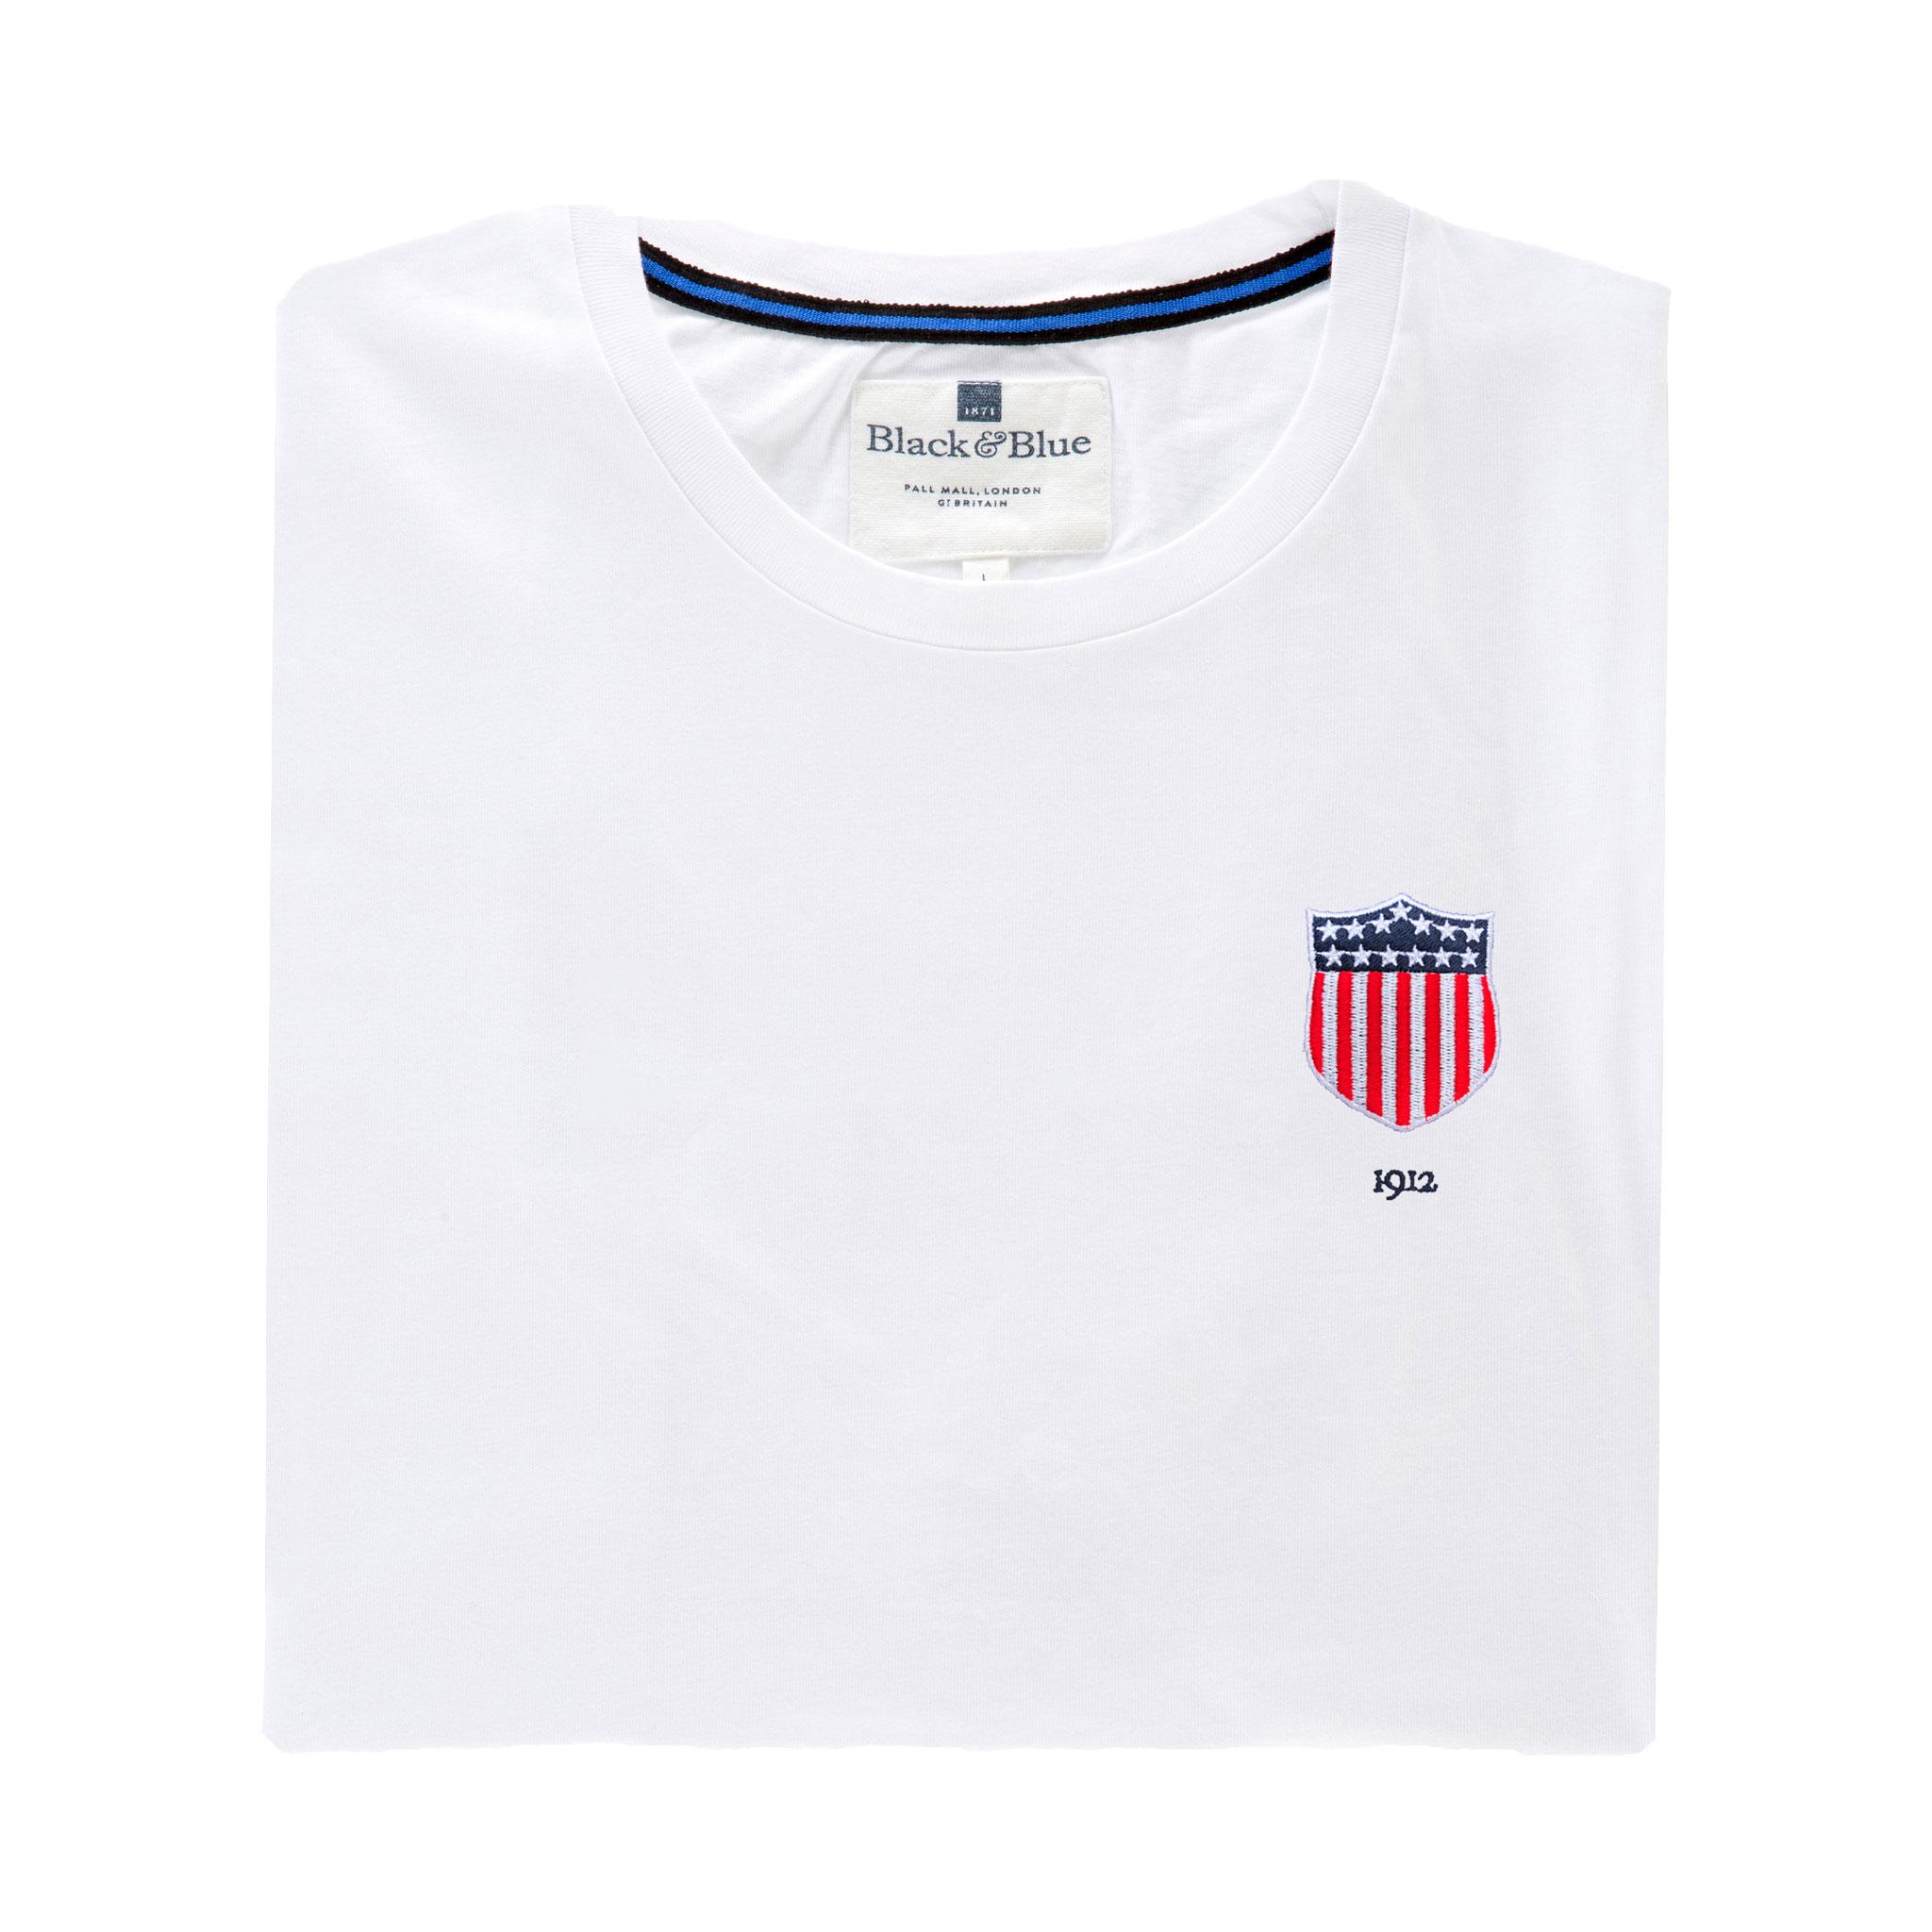 USA 1912 White Tshirt_Folded